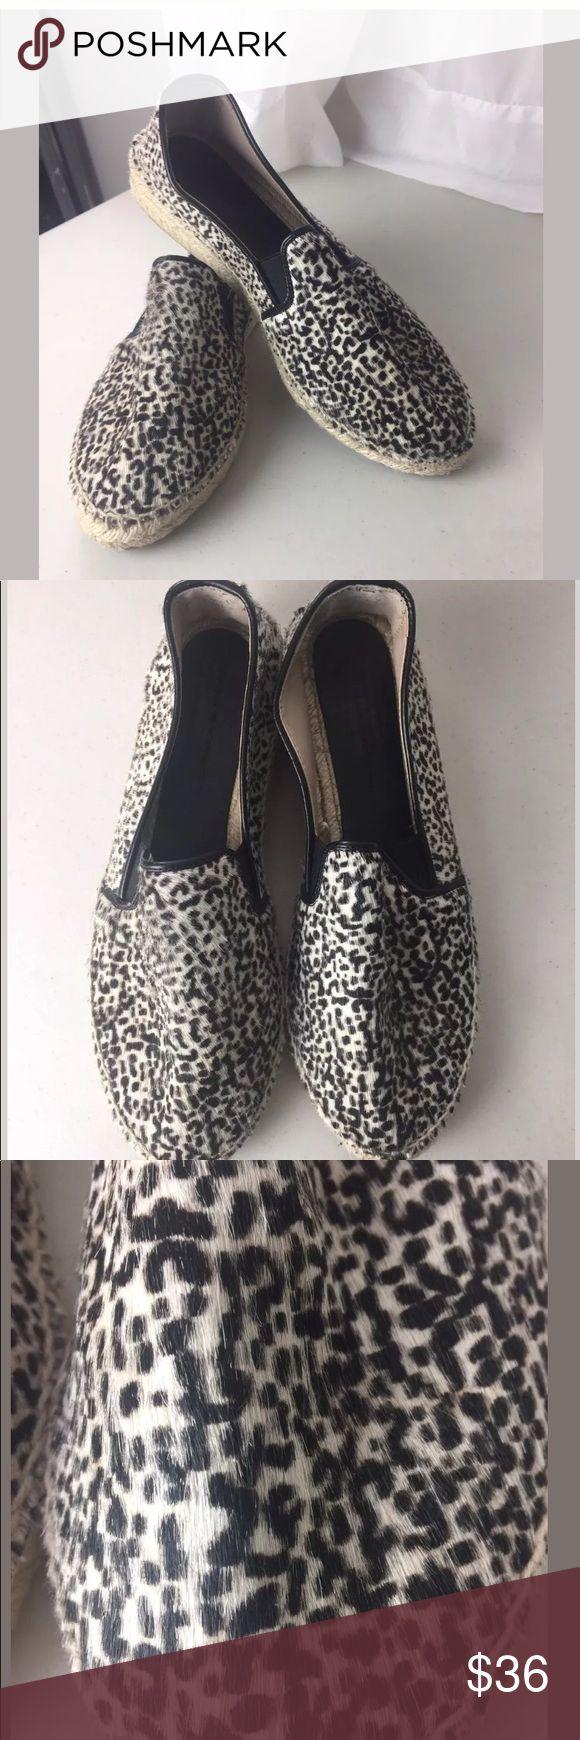 Zara Basic Calfhair Espadrilles Size 41 Zara Basic Animal print Espadrilles. Excellent preowned condition. Size 41 Zara Shoes Espadrilles